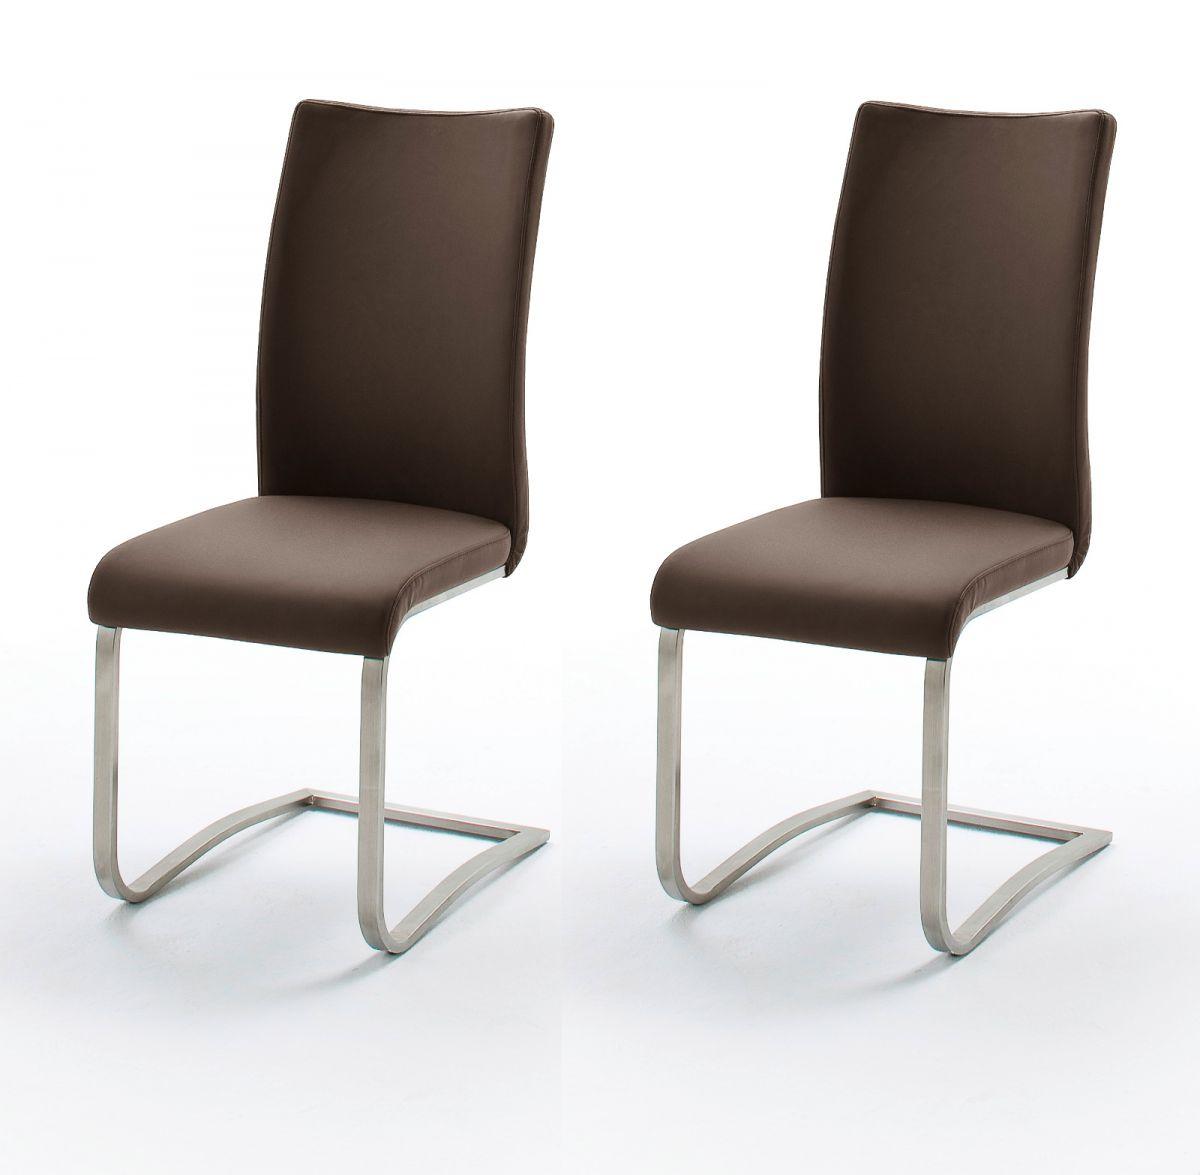 2 x Stuhl Arco Braun Schwinger Kunstleder